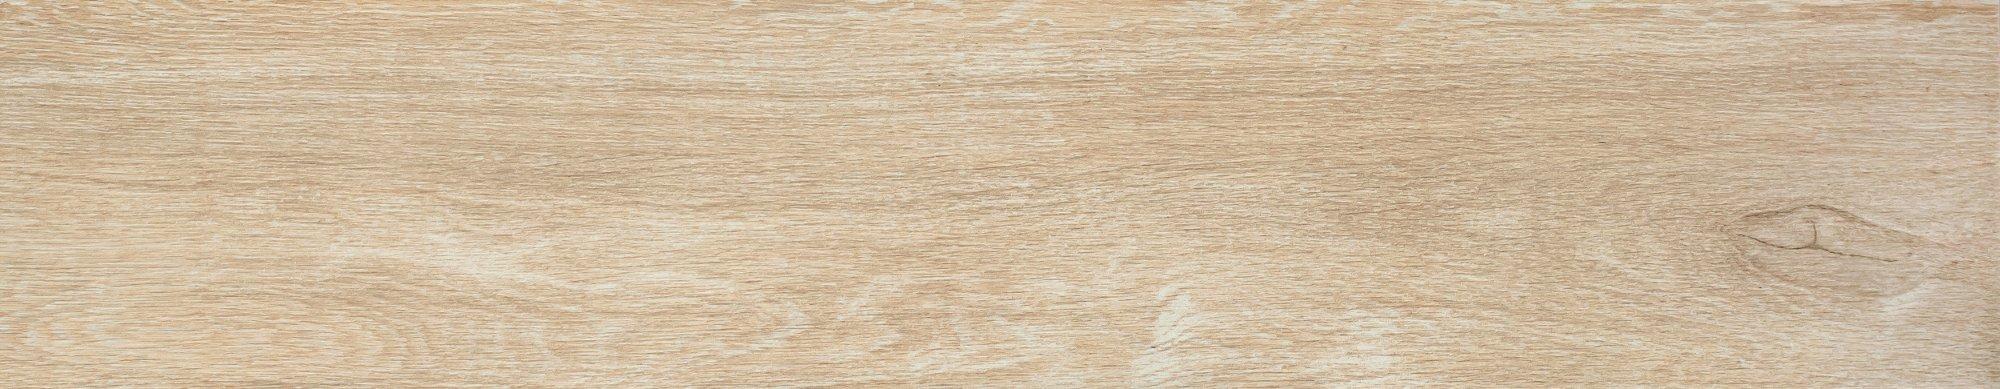 Catalea desert - dlaždice 17,5x90 béžová